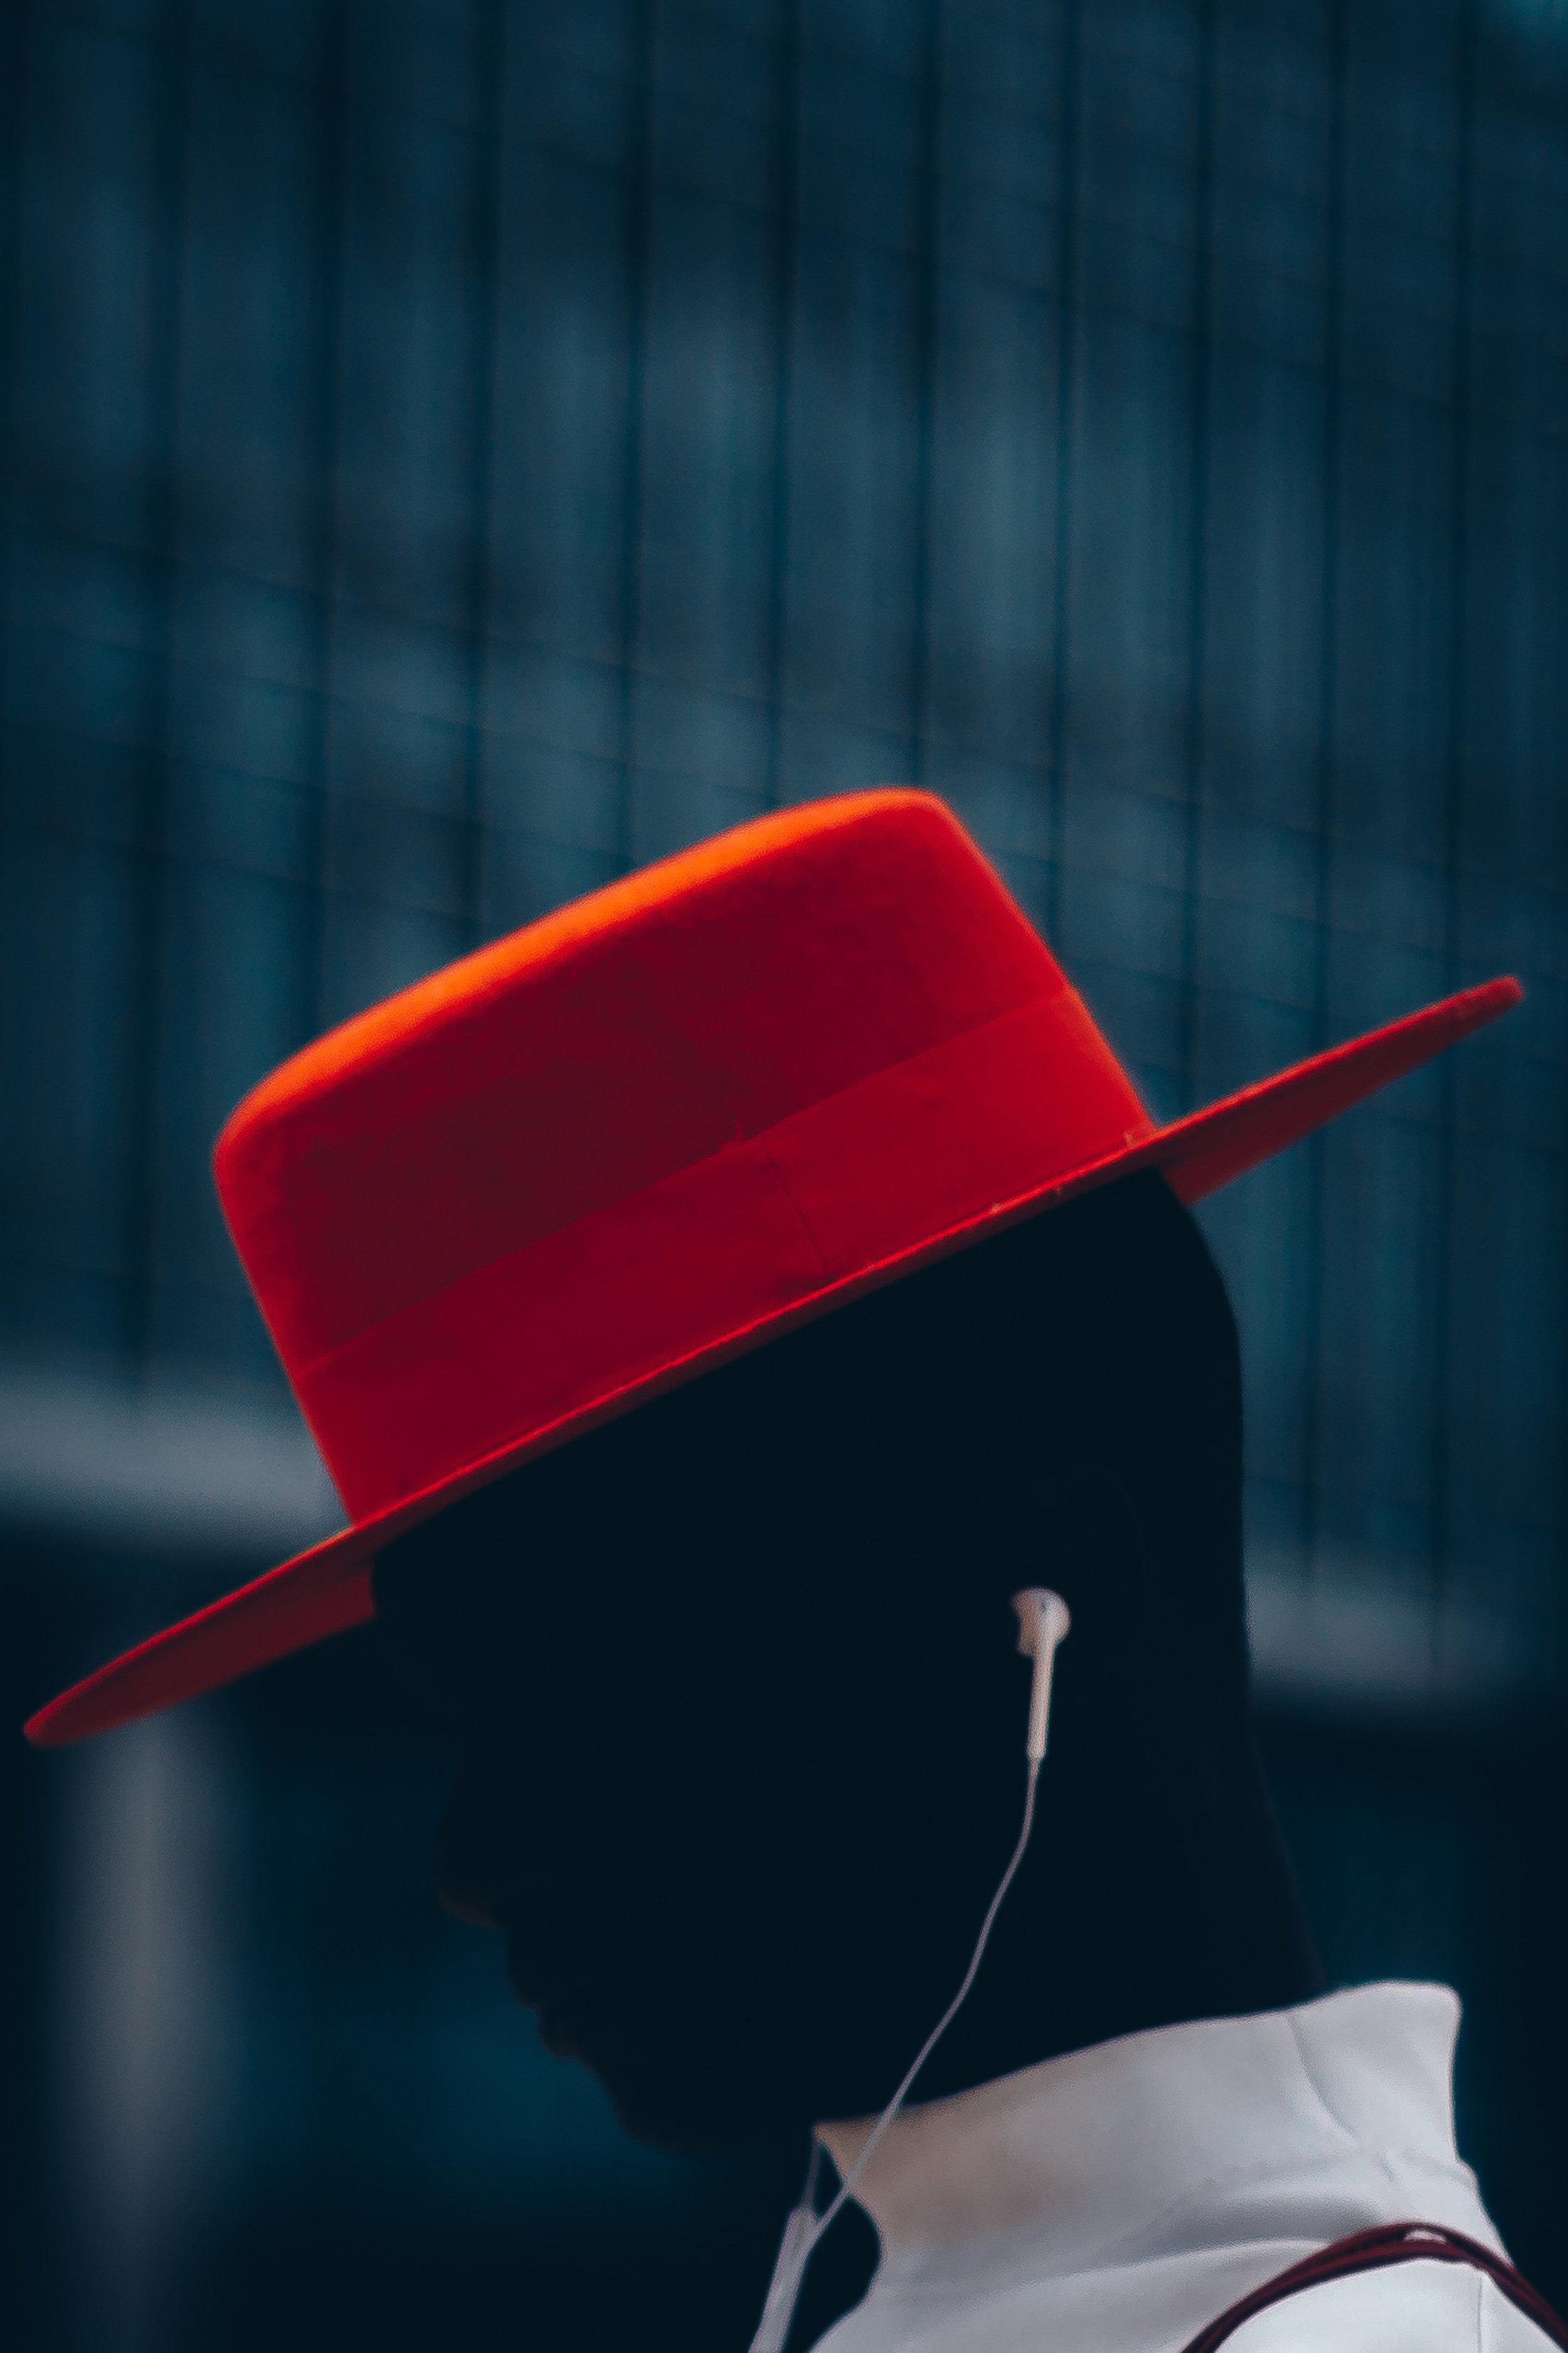 Lot 169. Red Hat Joe